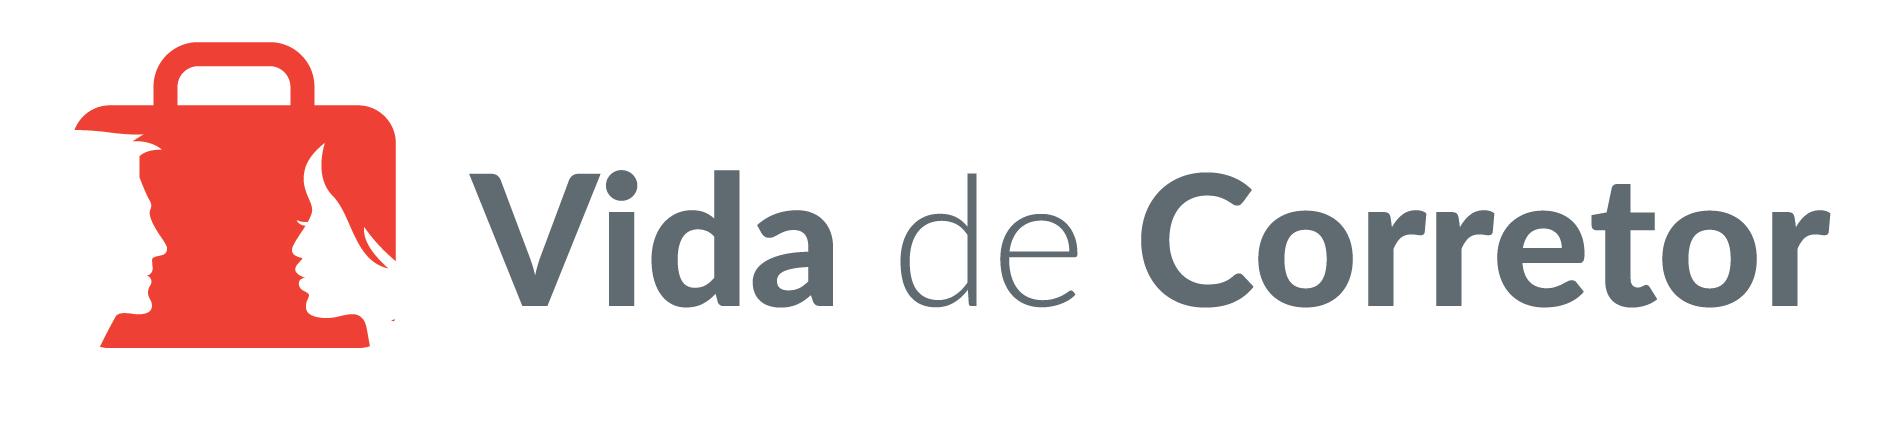 Logotipo Vida de Corretor